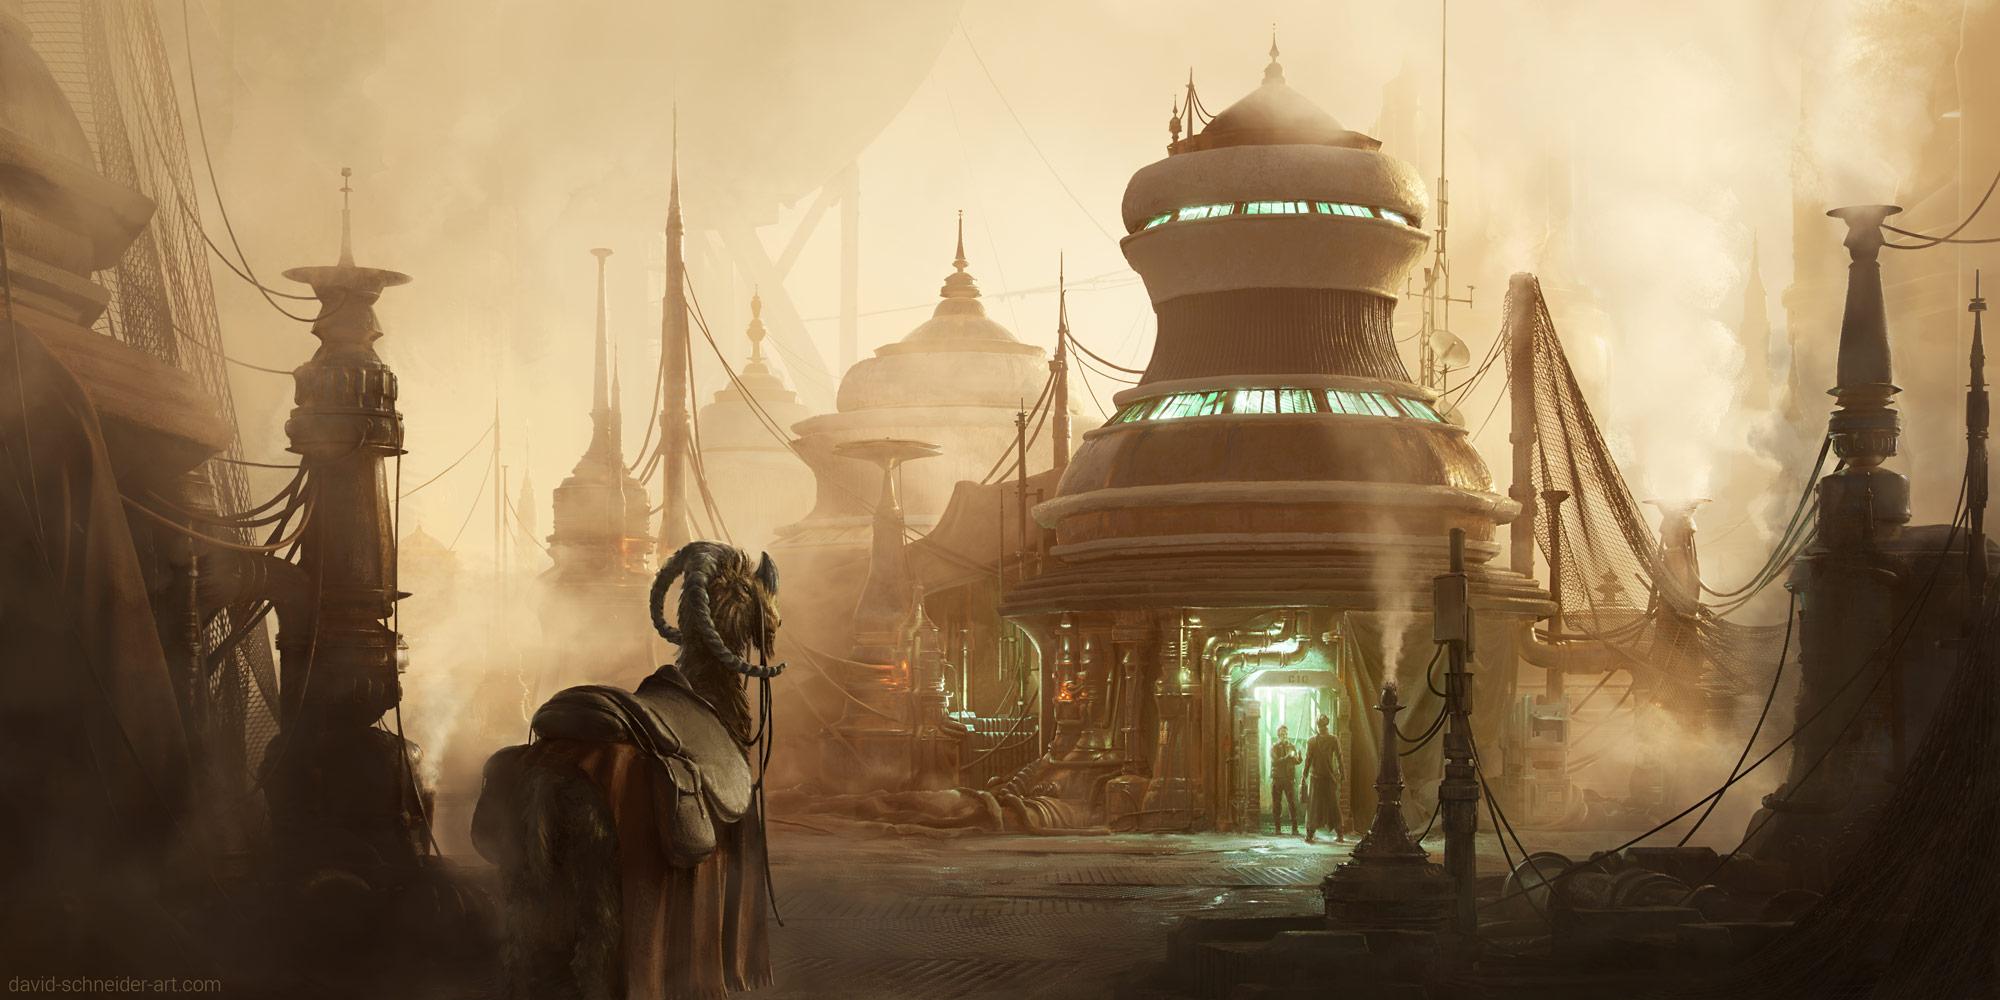 star wars, concept art, scifi, science fiction, fantasy, tatooine, illustration, environment, David Schneider